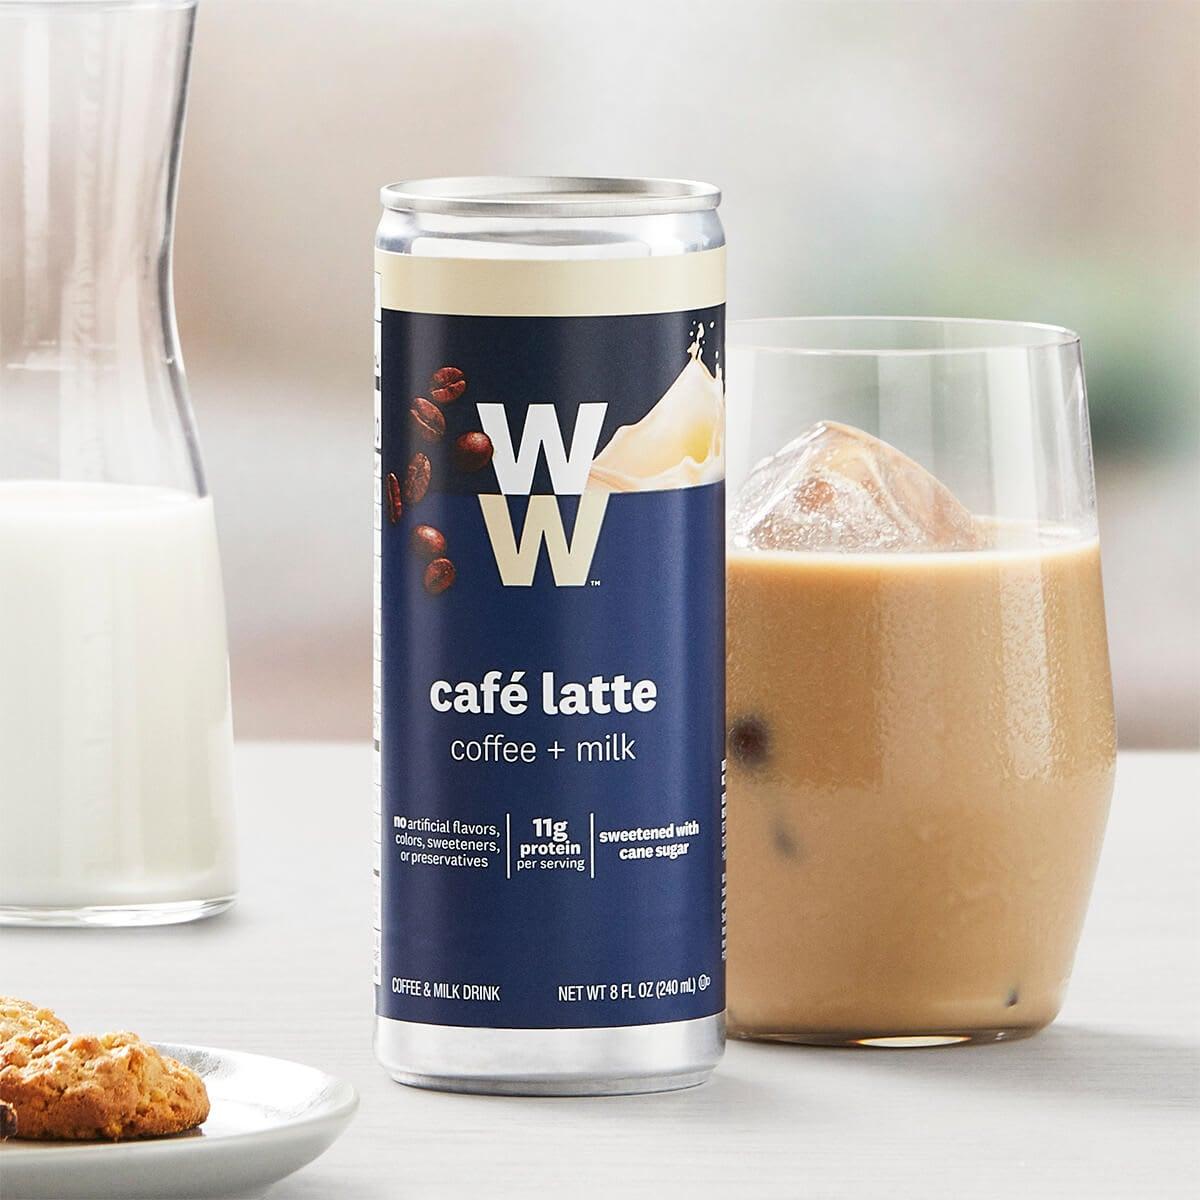 Cafe Latte - lifestyle